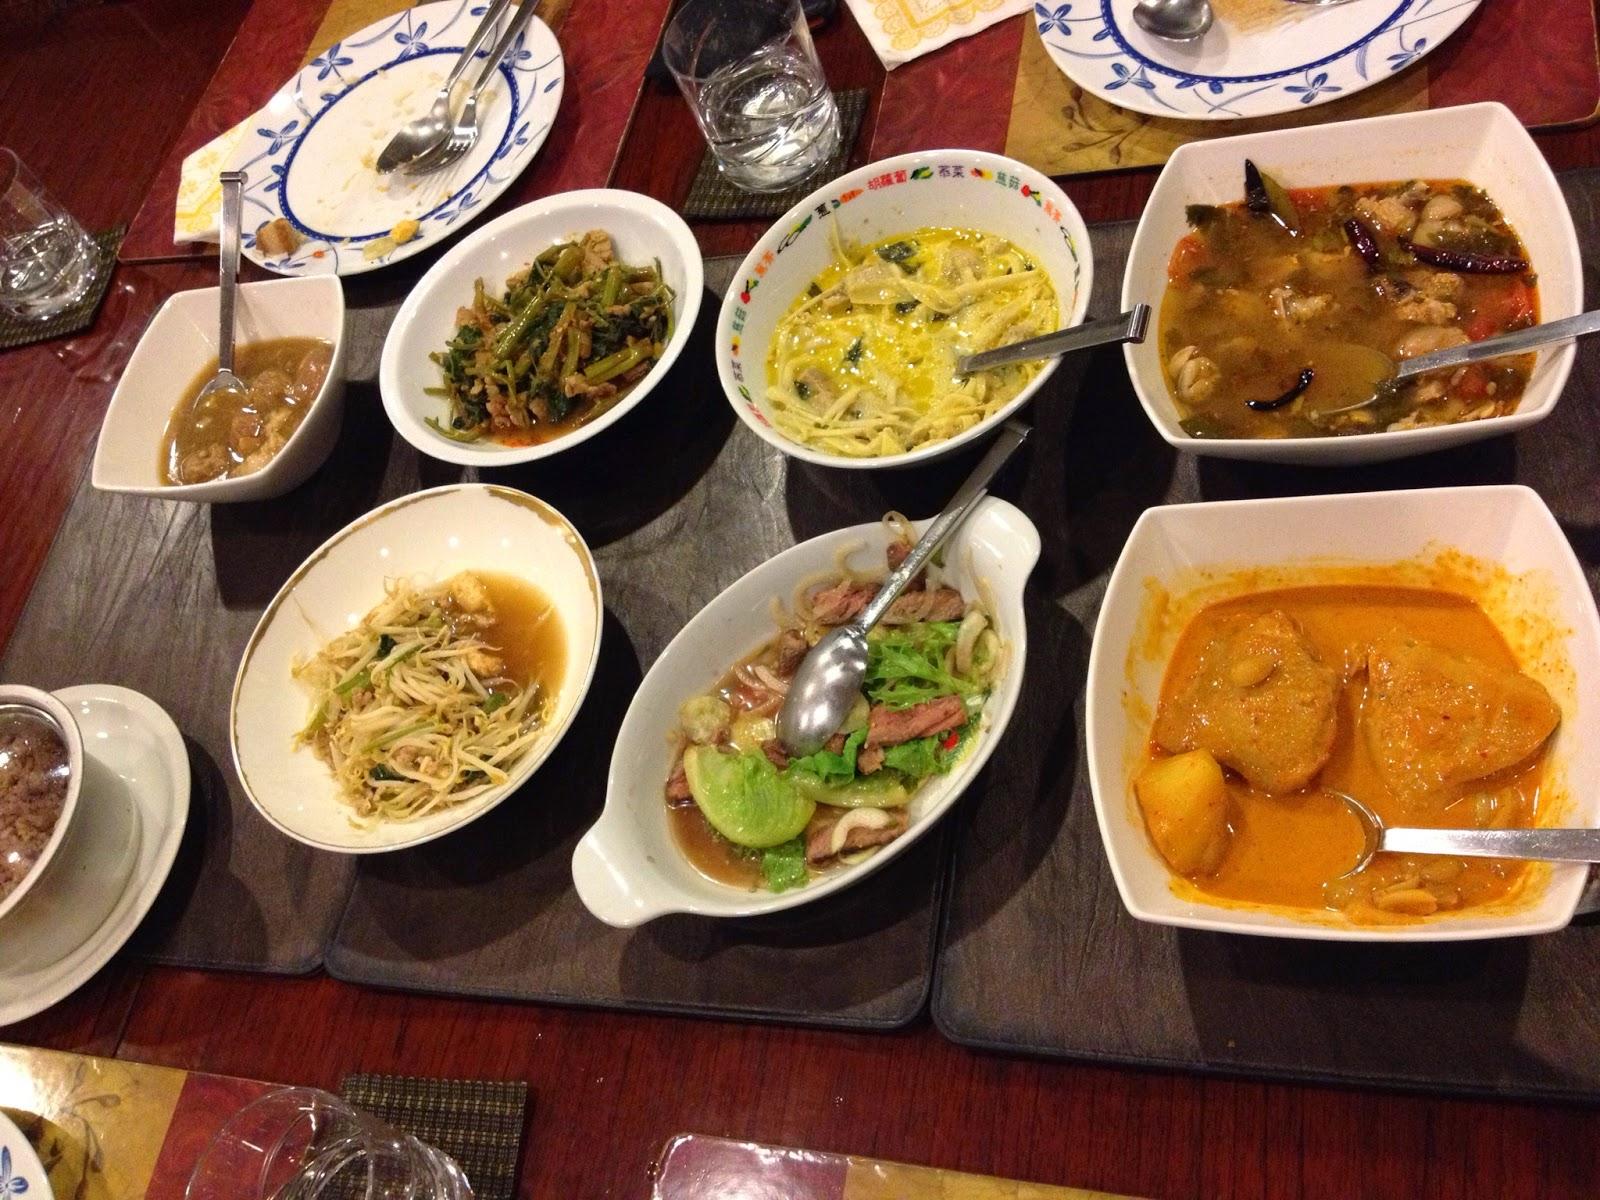 Bangkok - Home cooked meal